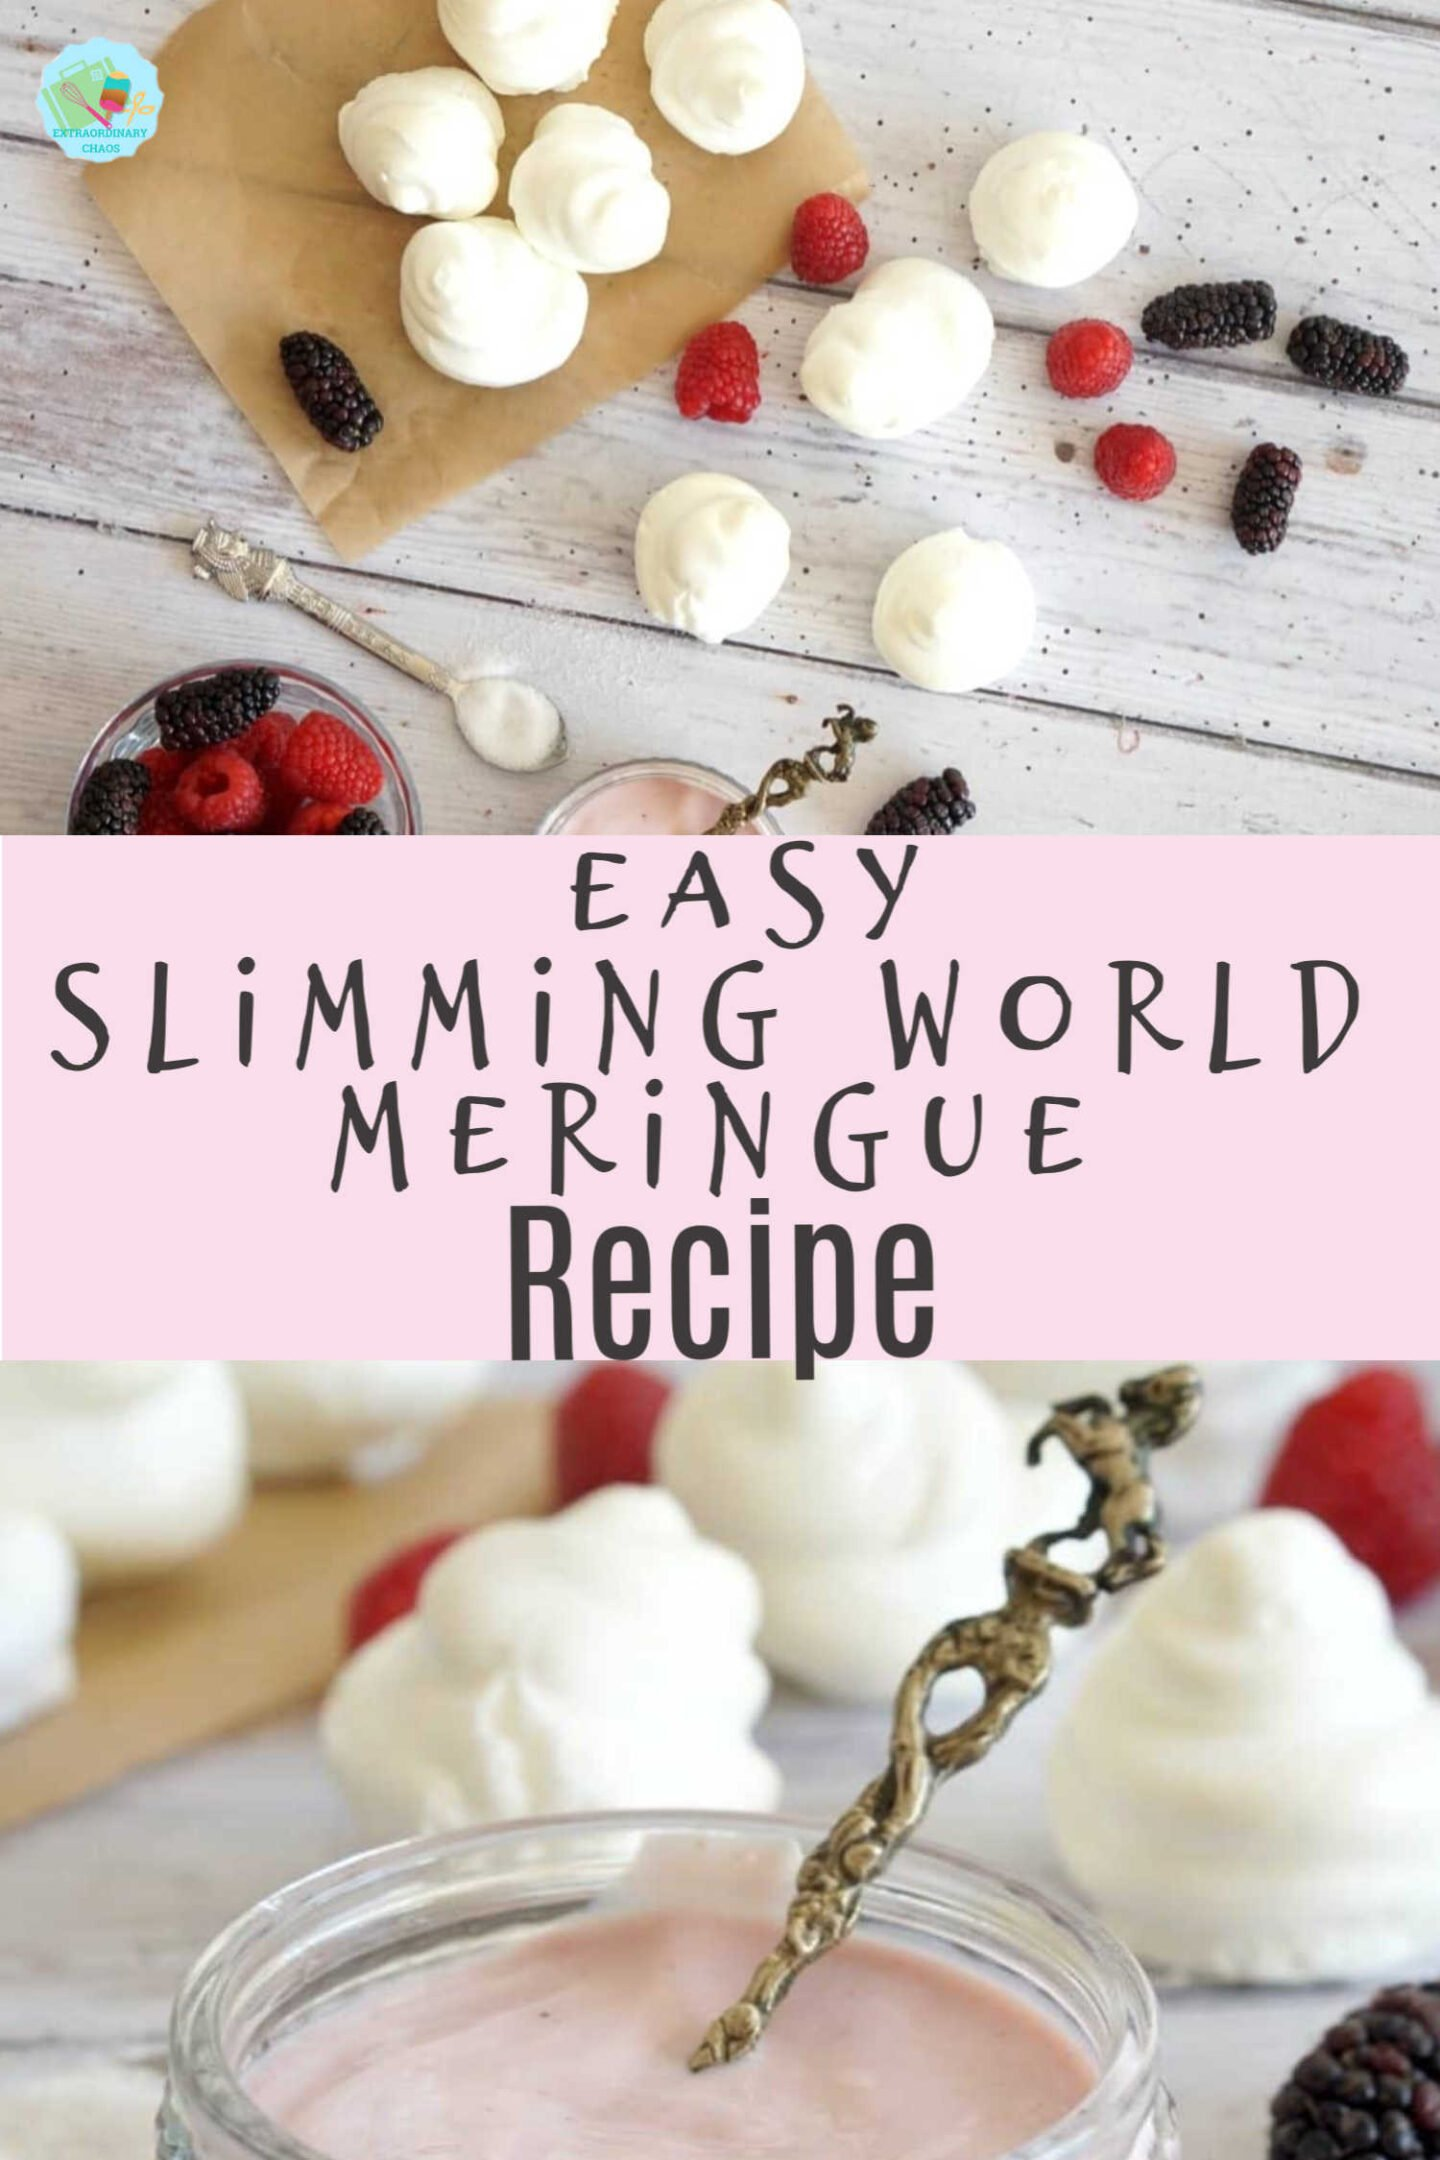 Easy slimming world meringue recipe to get perfect low syn Meringues